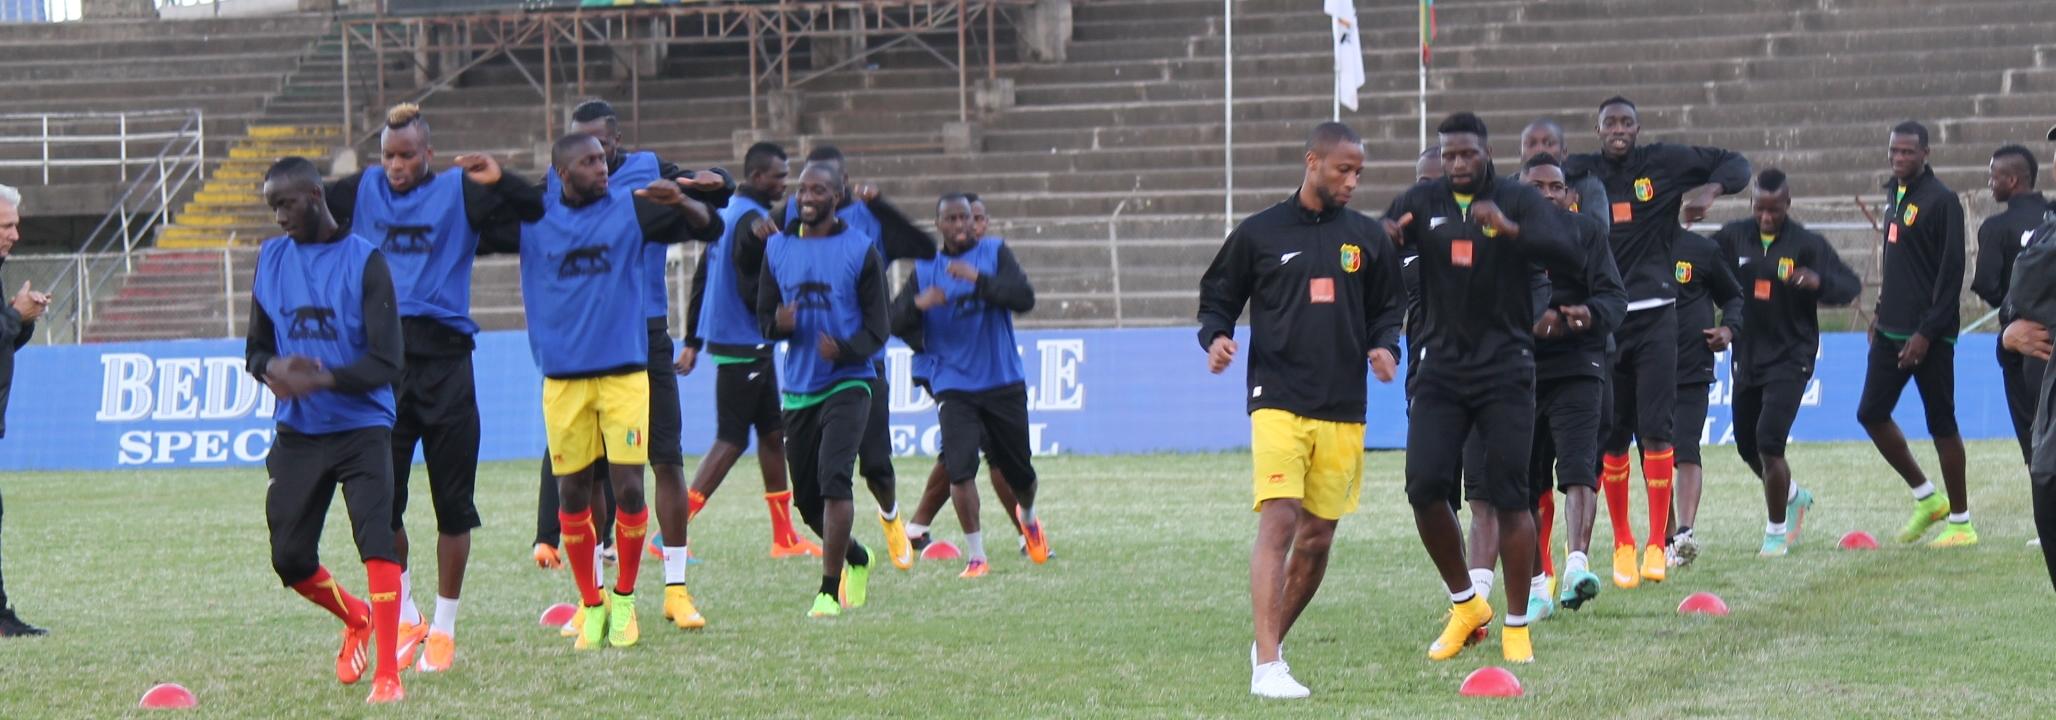 Team Mali Training at Addis Ababa Stadium